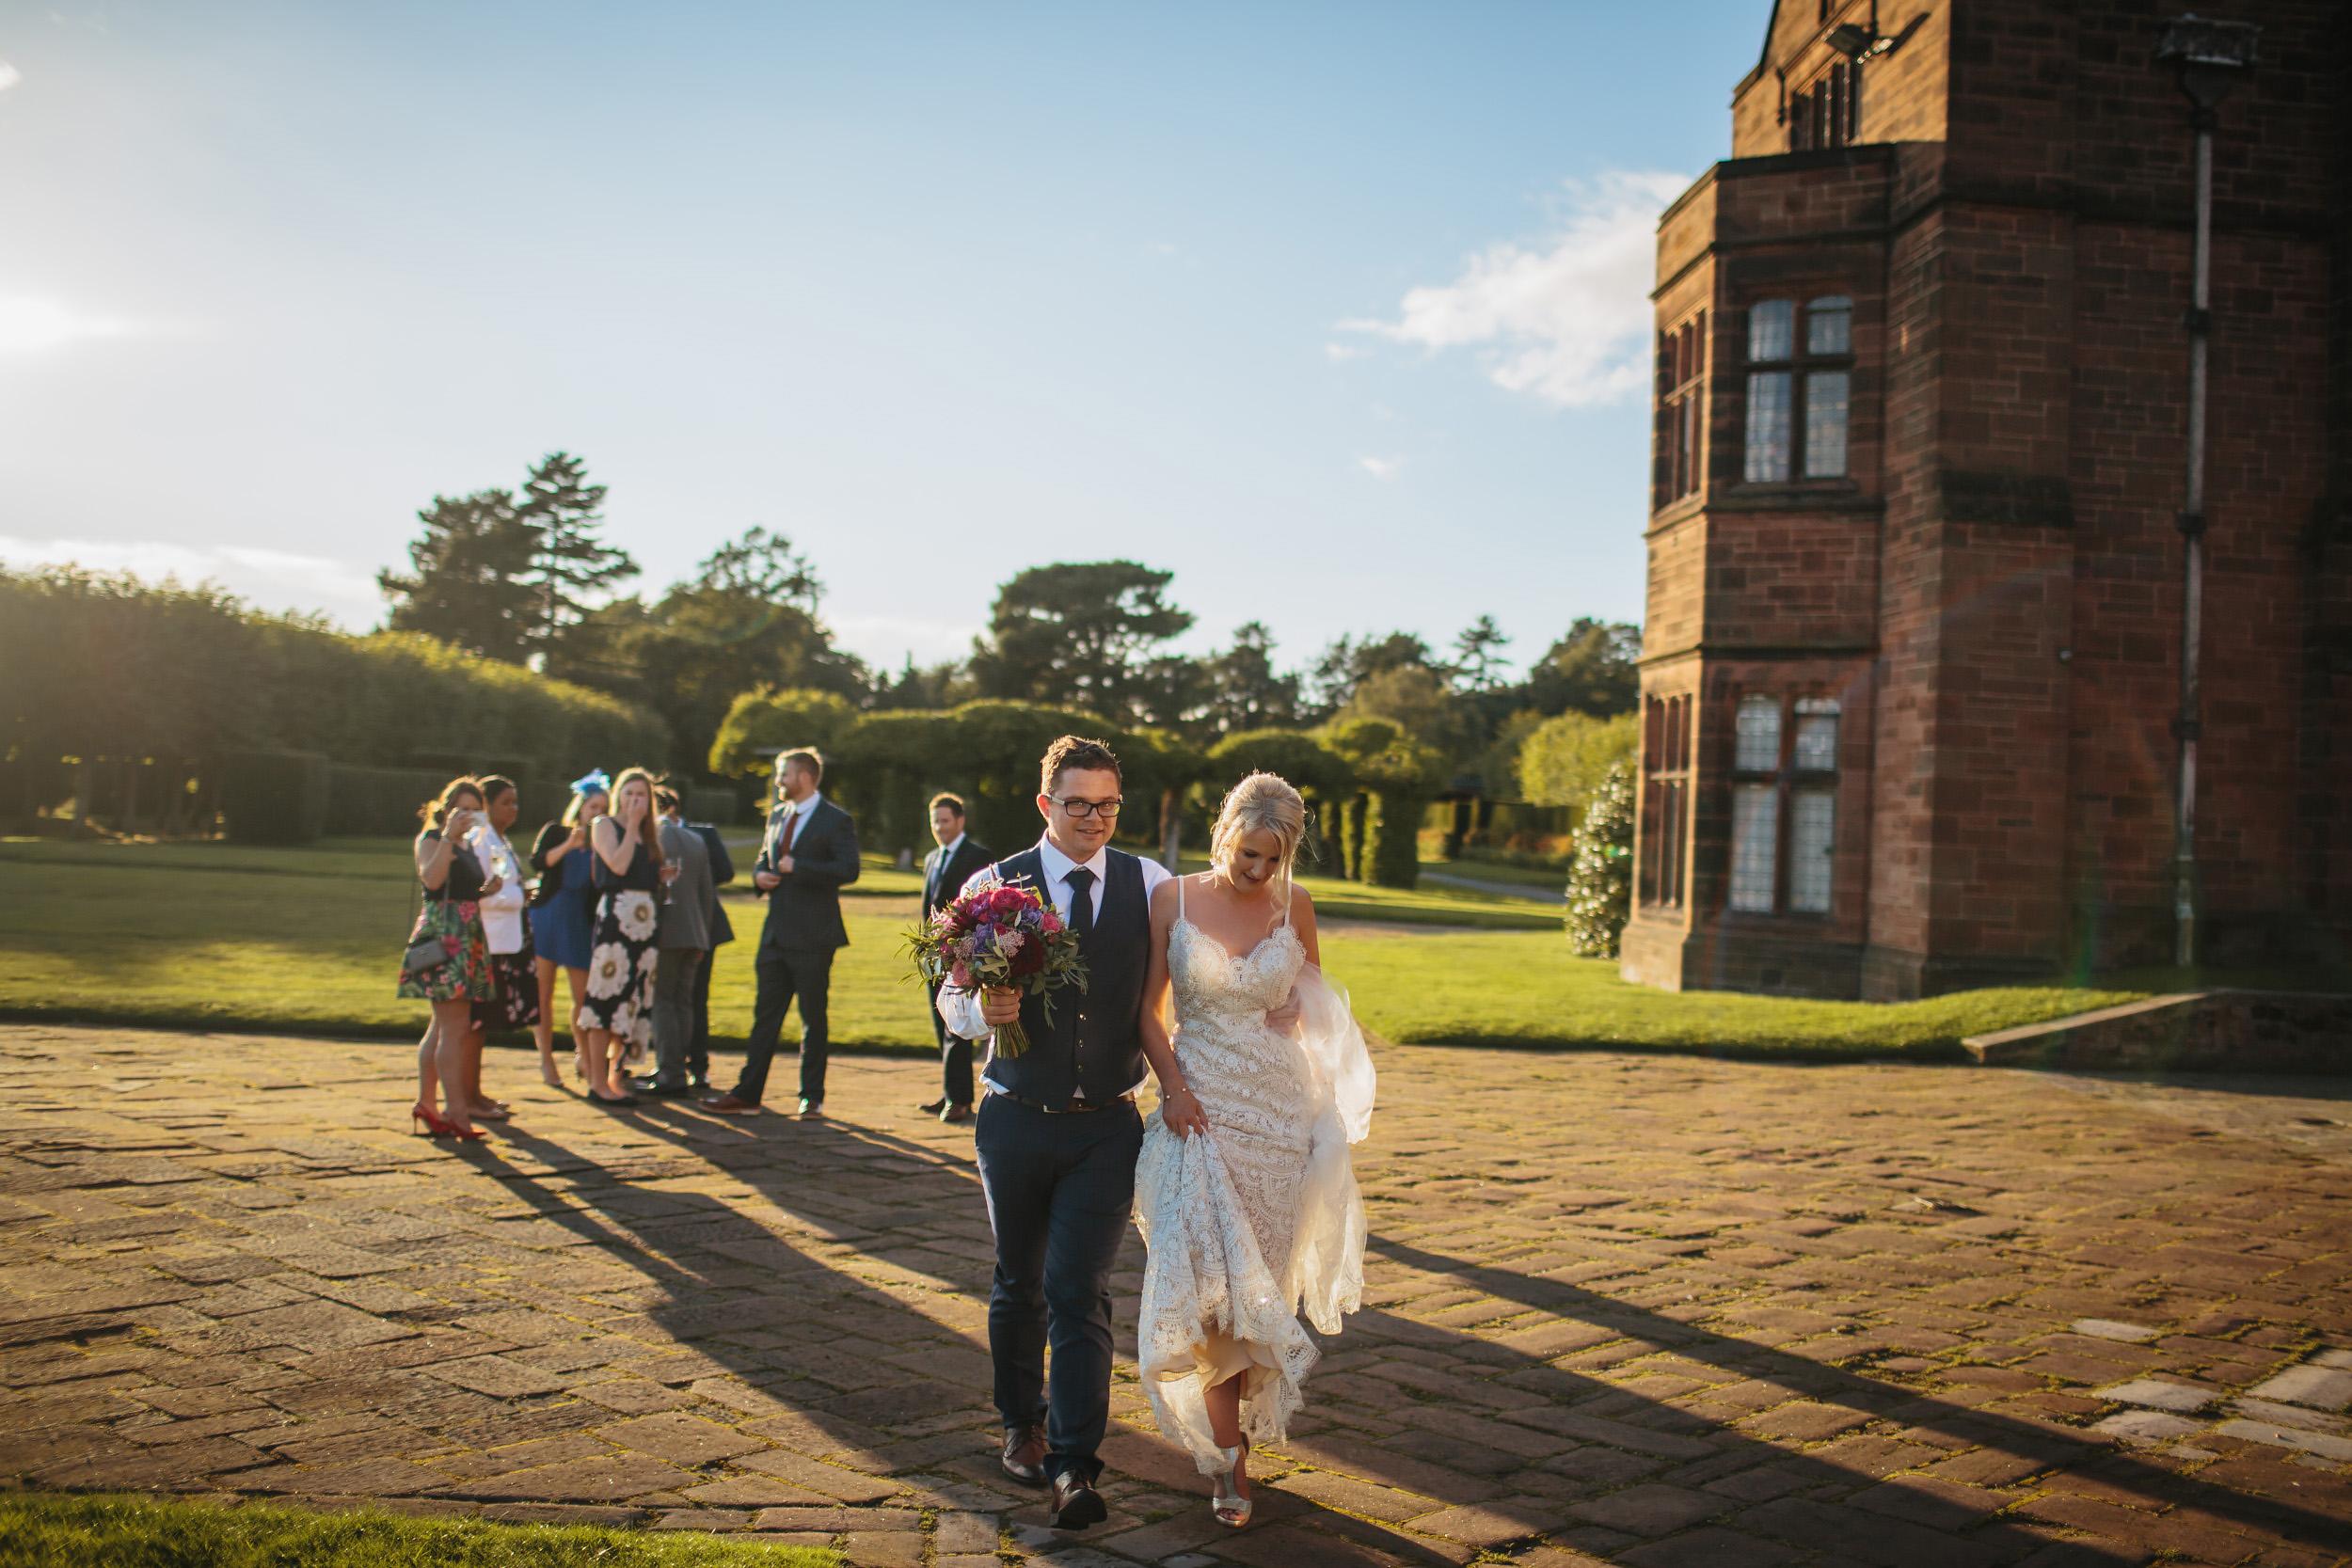 Wedding at Thornton Manor Cheshire